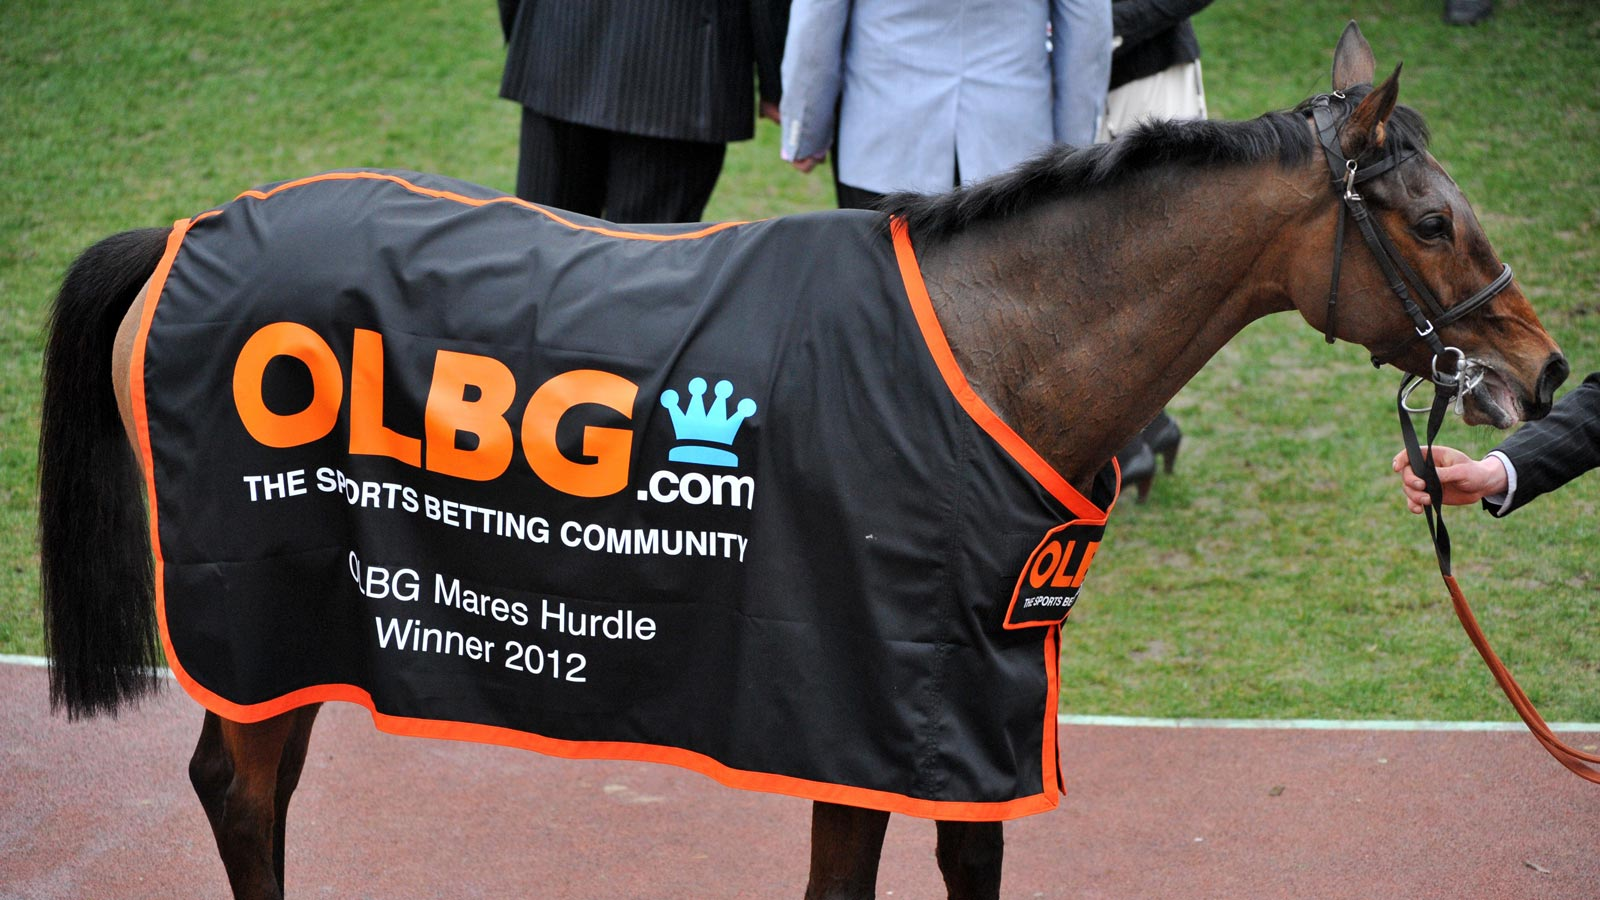 olbg mares hurdle betting calculator